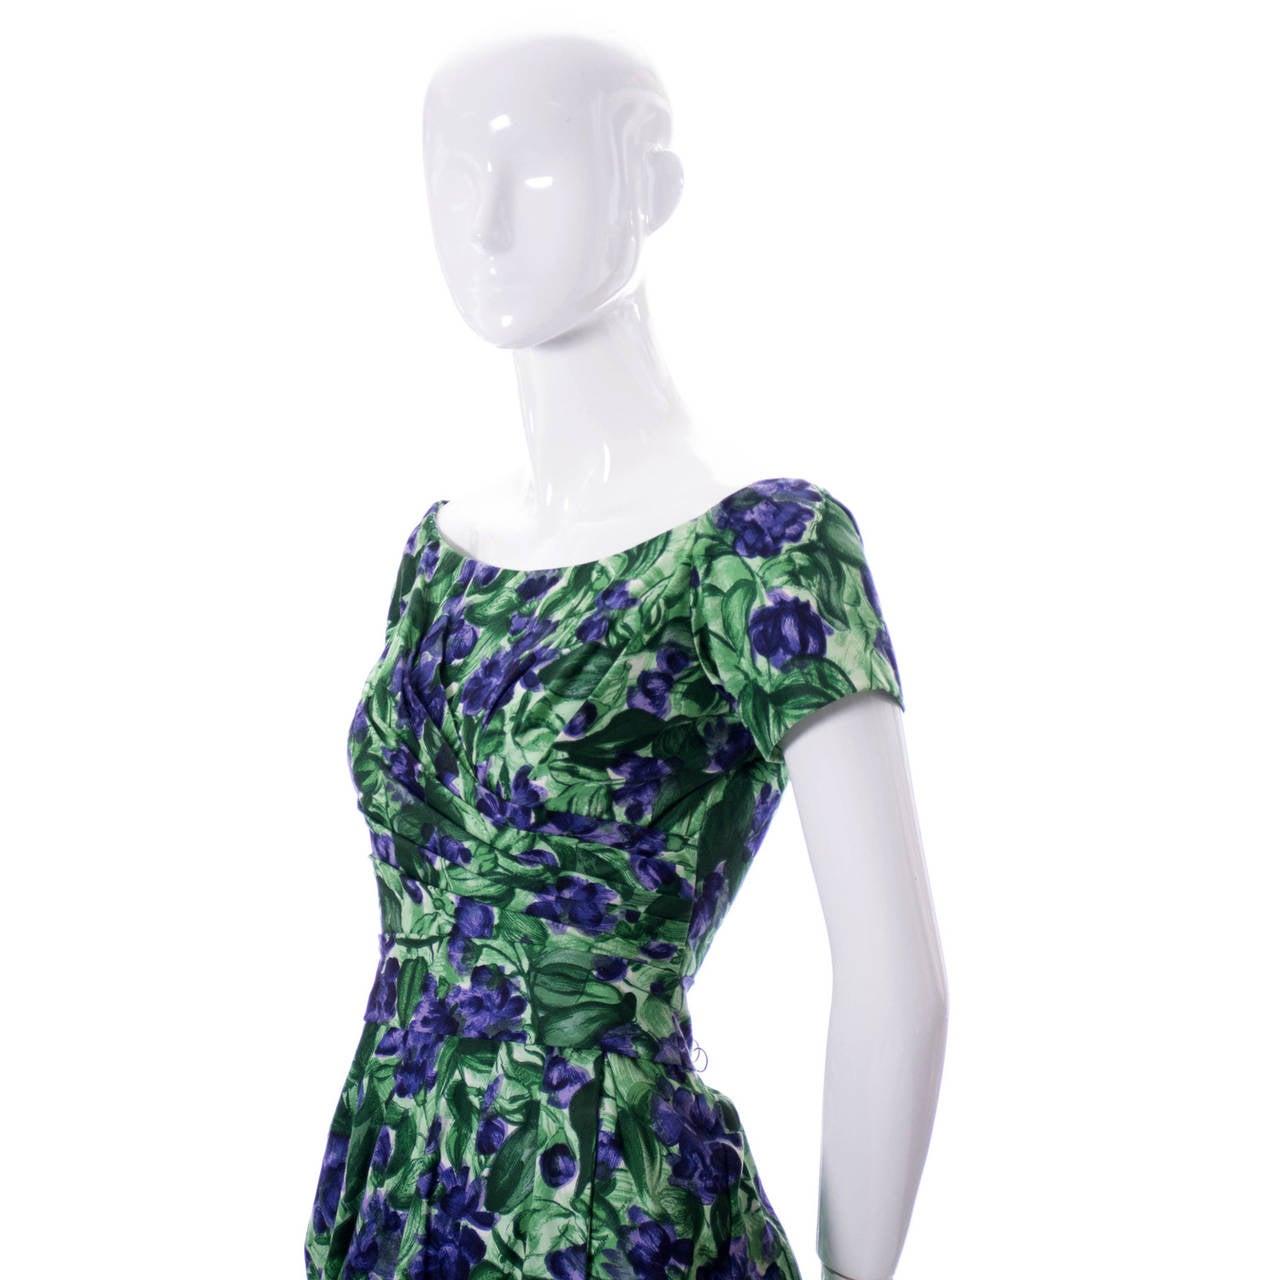 Women's Vintage Ceil Chapman 1950s Dress in Purple Green Floral Silk Print For Sale